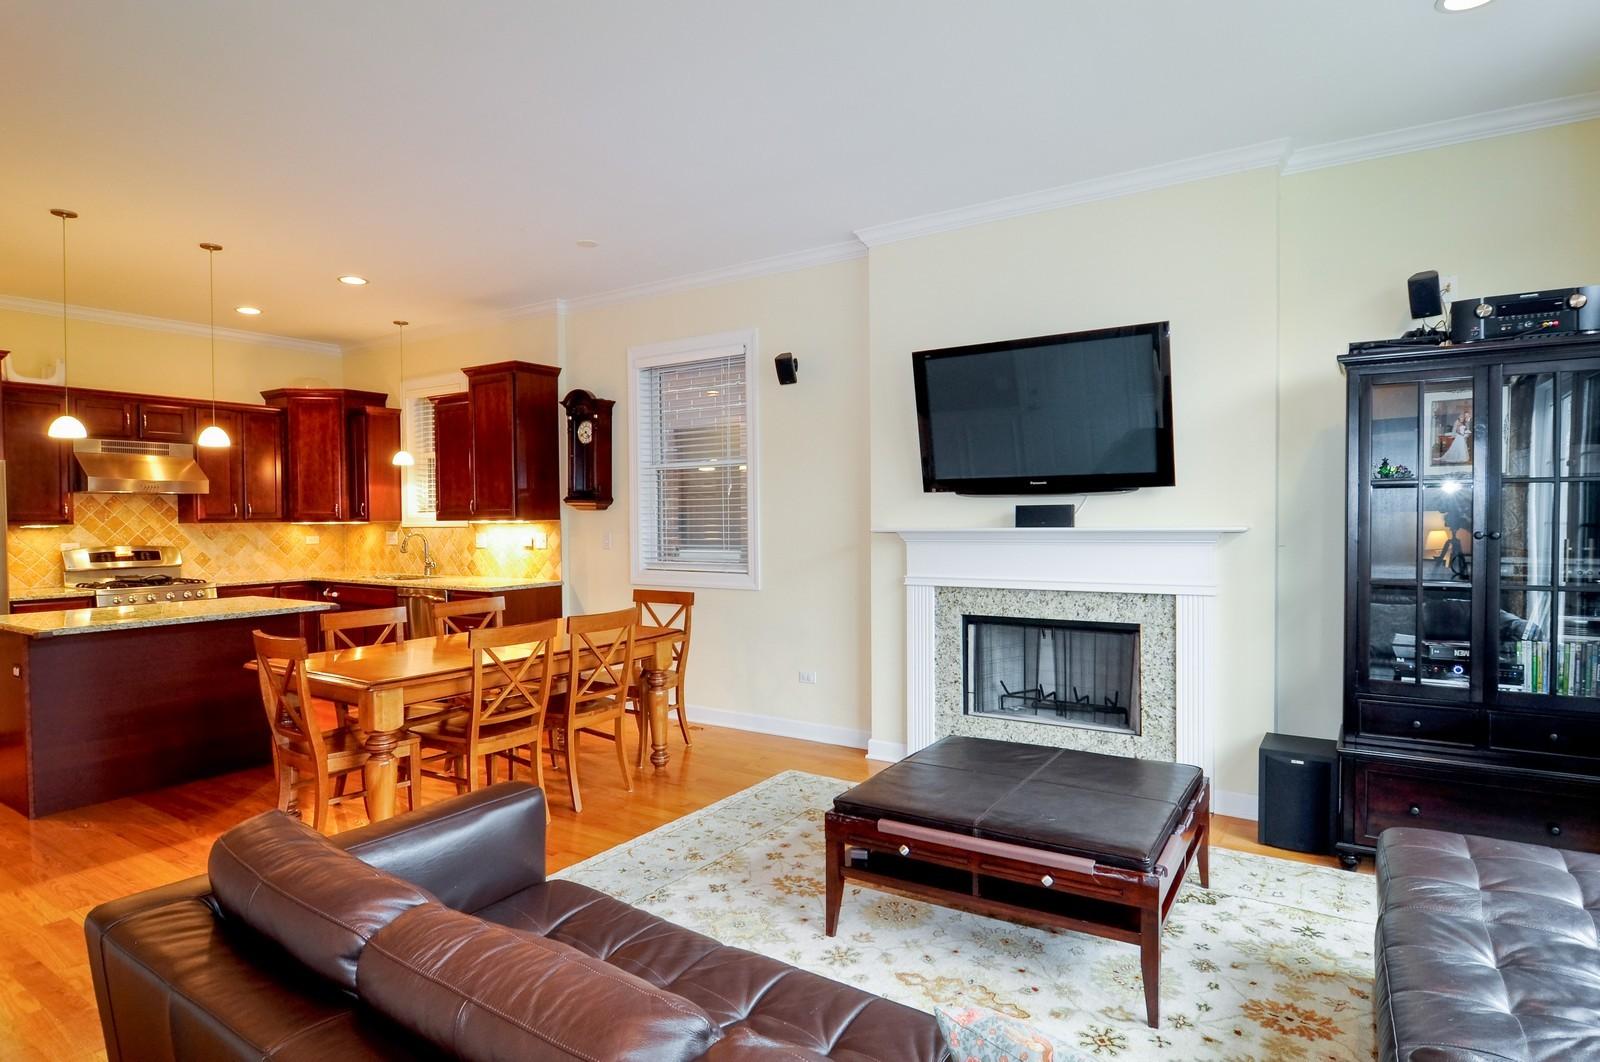 Real Estate Photography - 1846 W Armitage, Unit 2E, Chicago, IL, 60622 - Kitchen / Living Room